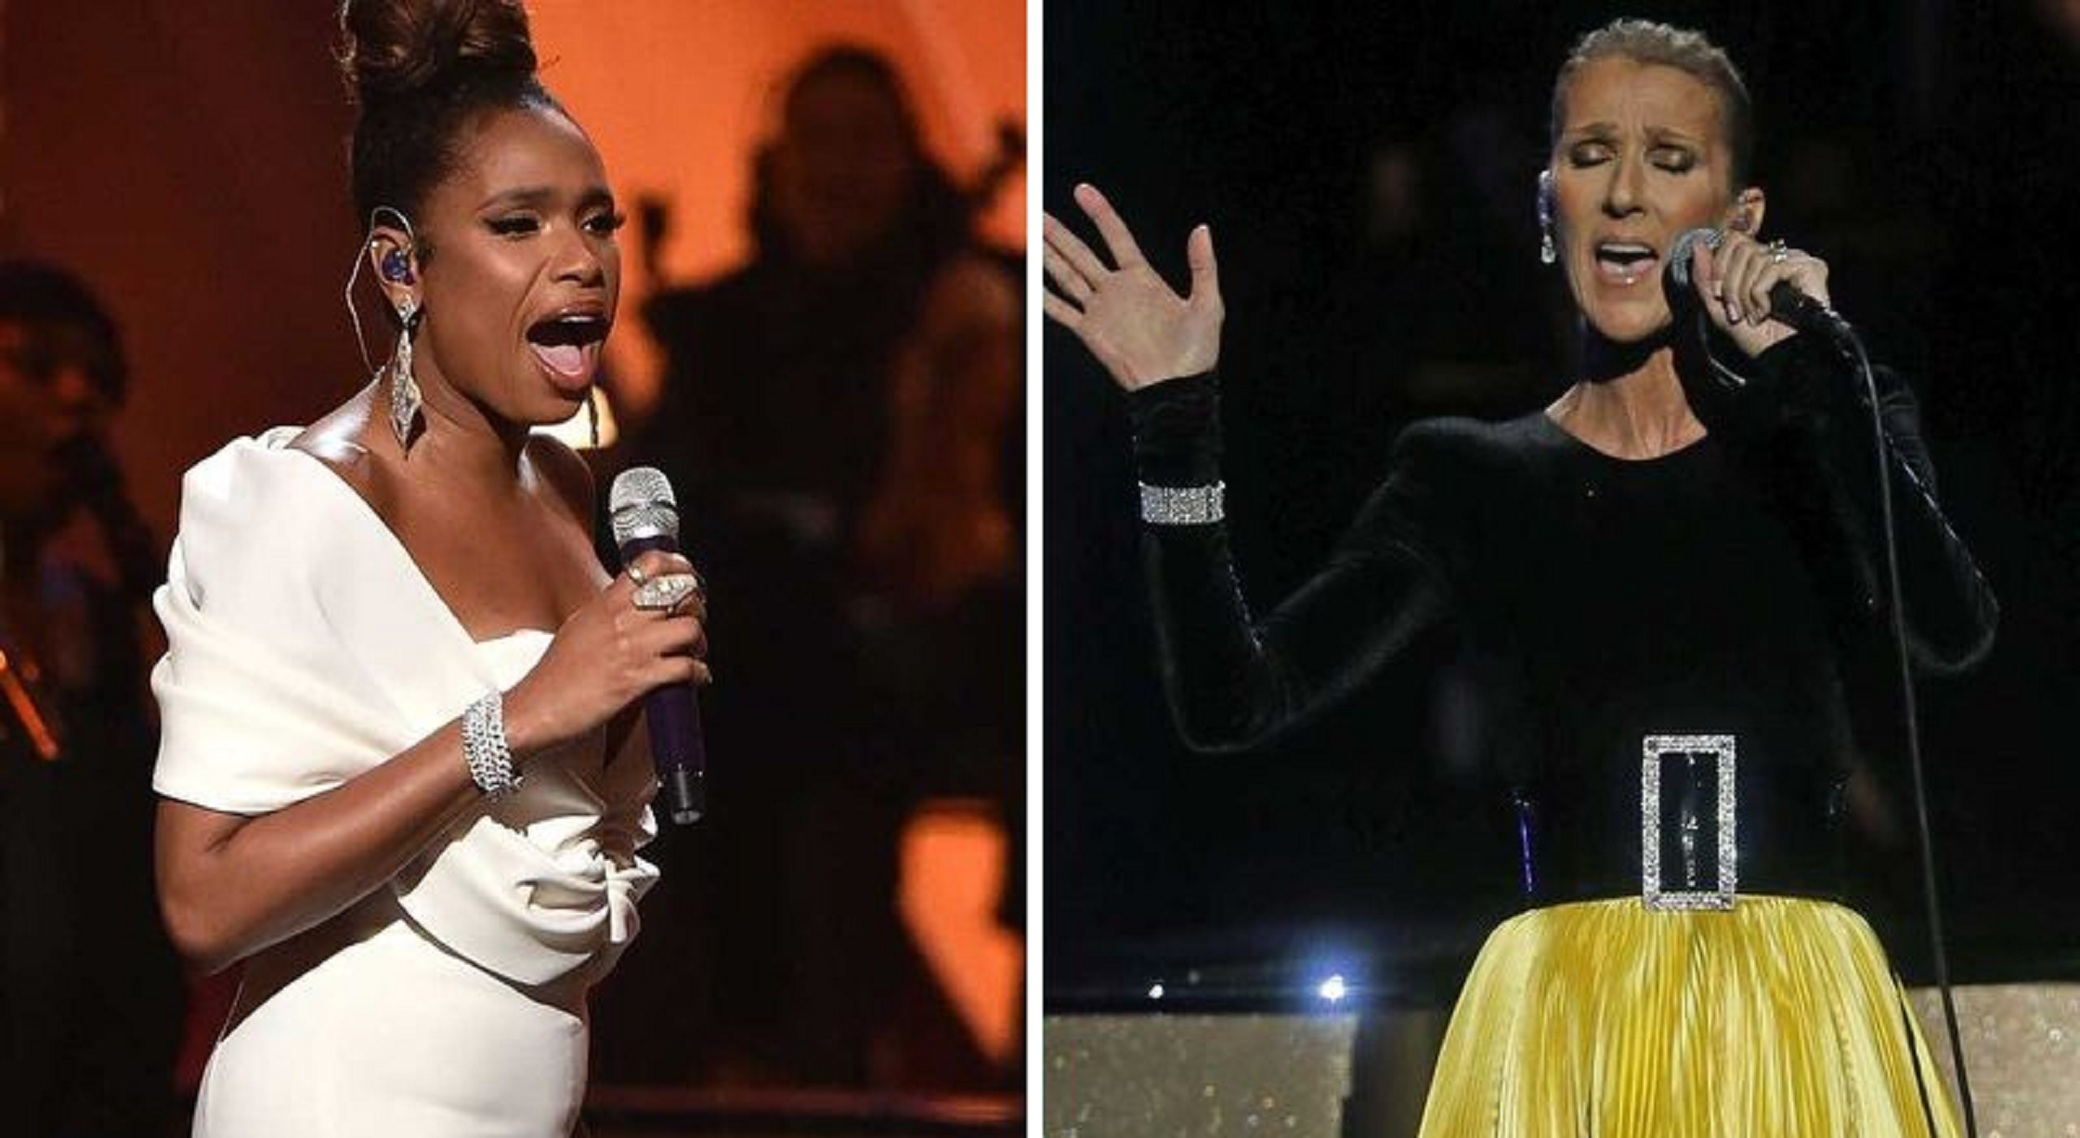 Jennifer Hudson, Celine Dion, Patti LaBelle & More Come Together To Tribute Aretha Franklin